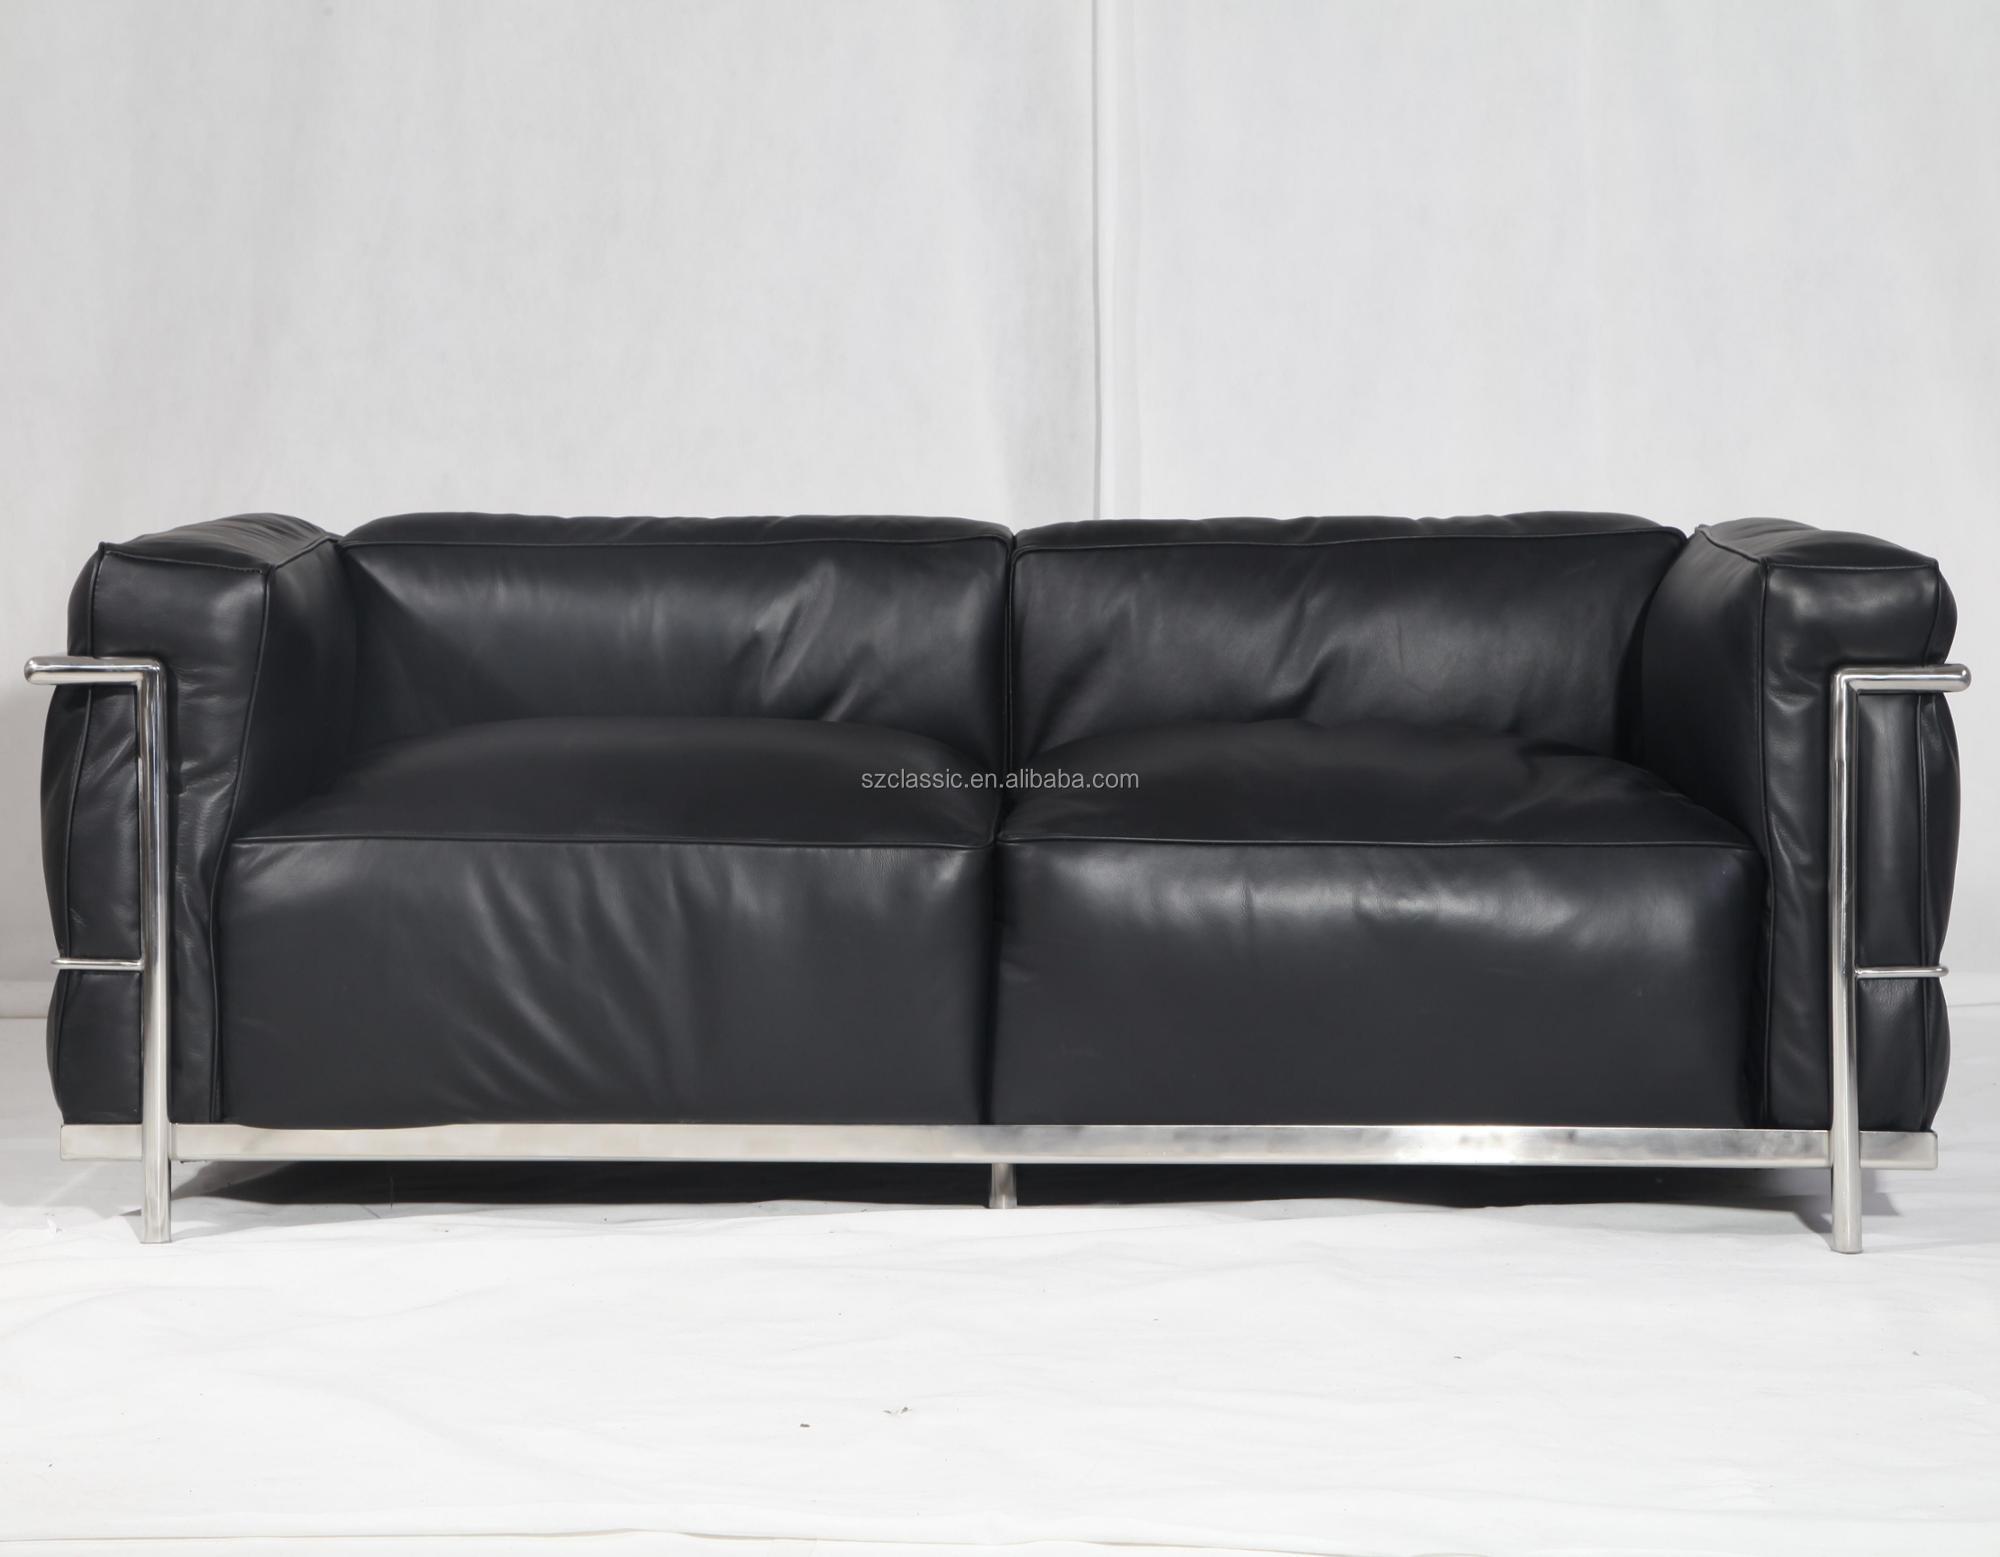 Bauhaus Style Furniture Full Grain Cow Leather Le Corbusier Lc3 Sofa Grand Confort Reproduction